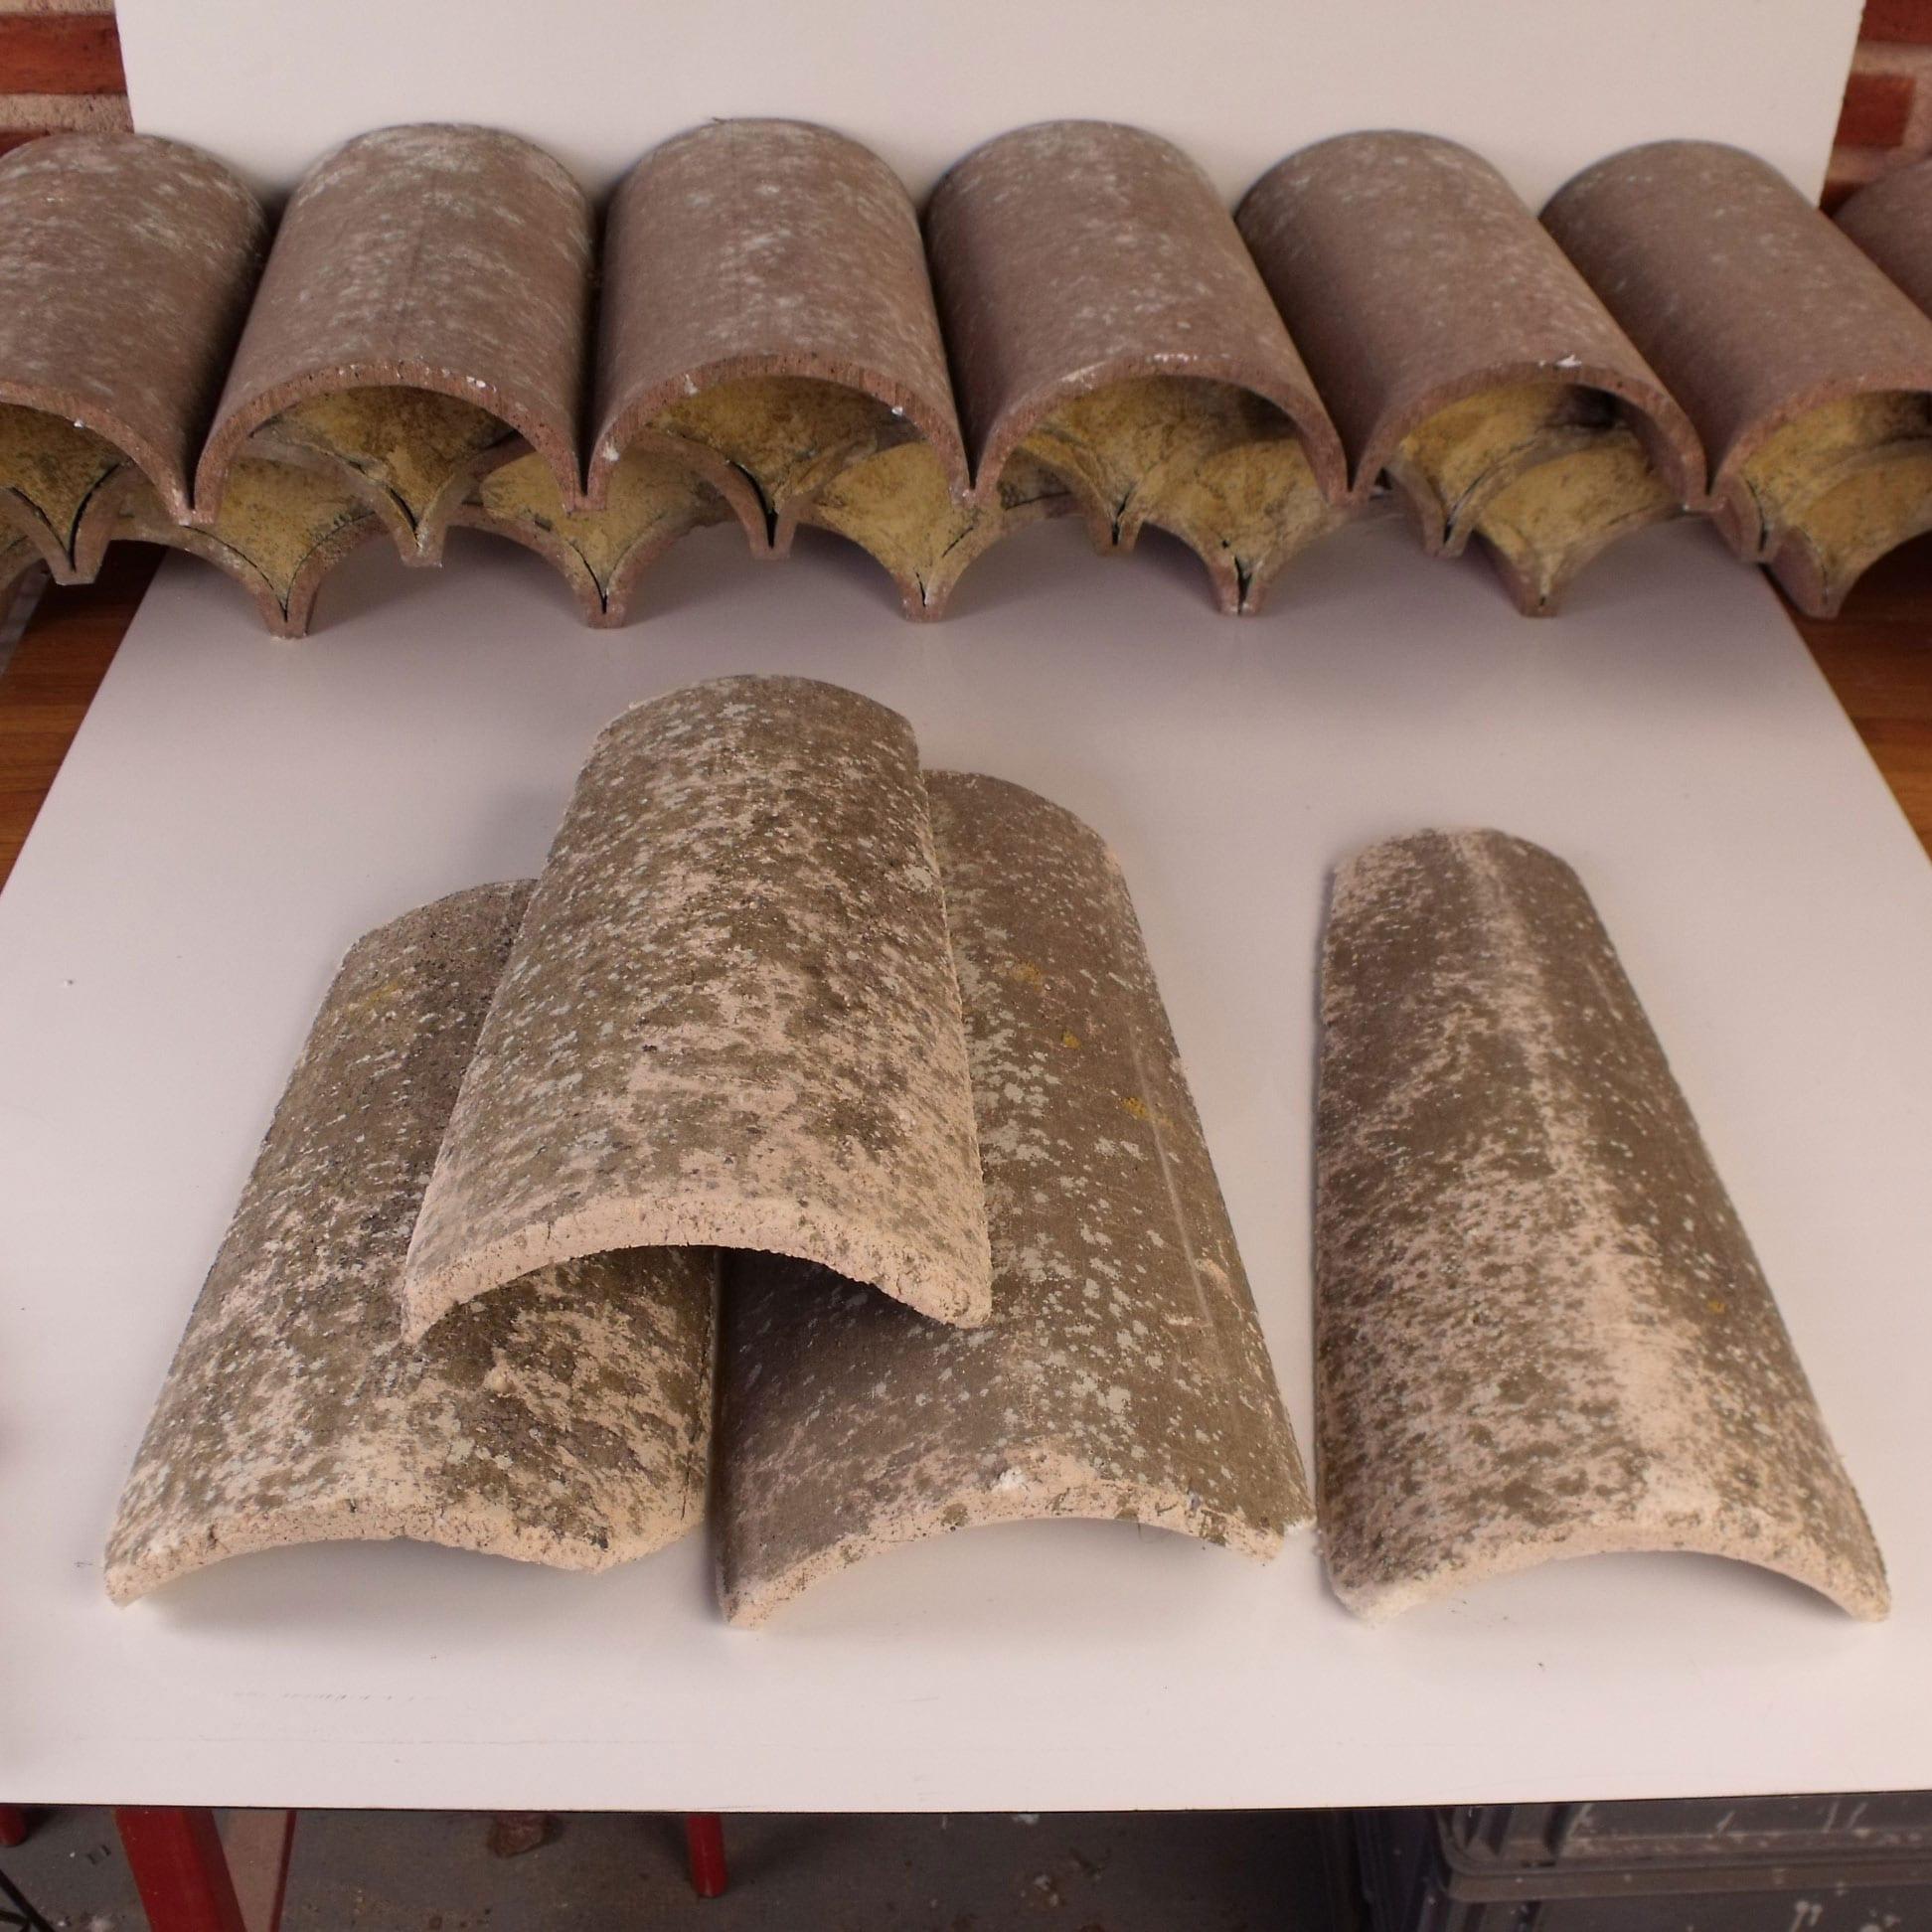 objets-en-polystyrène-factices-fausses-tuiles